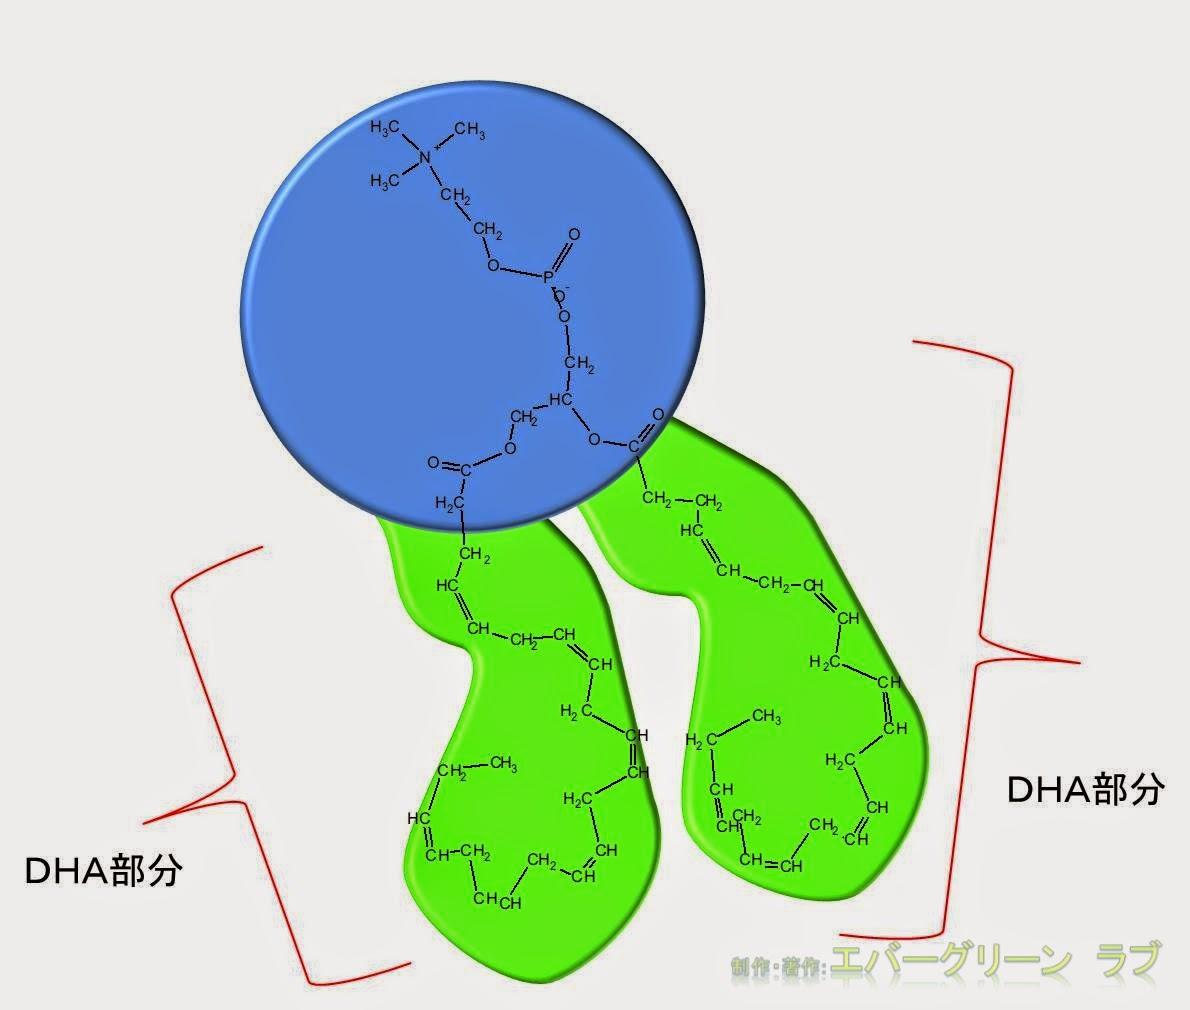 DHA, EPA, アラキドン酸, オメガ(ω)3, オメガ(ω)6, グリセロリン脂質, 動脈硬化, 脂肪, 脂質二重層,